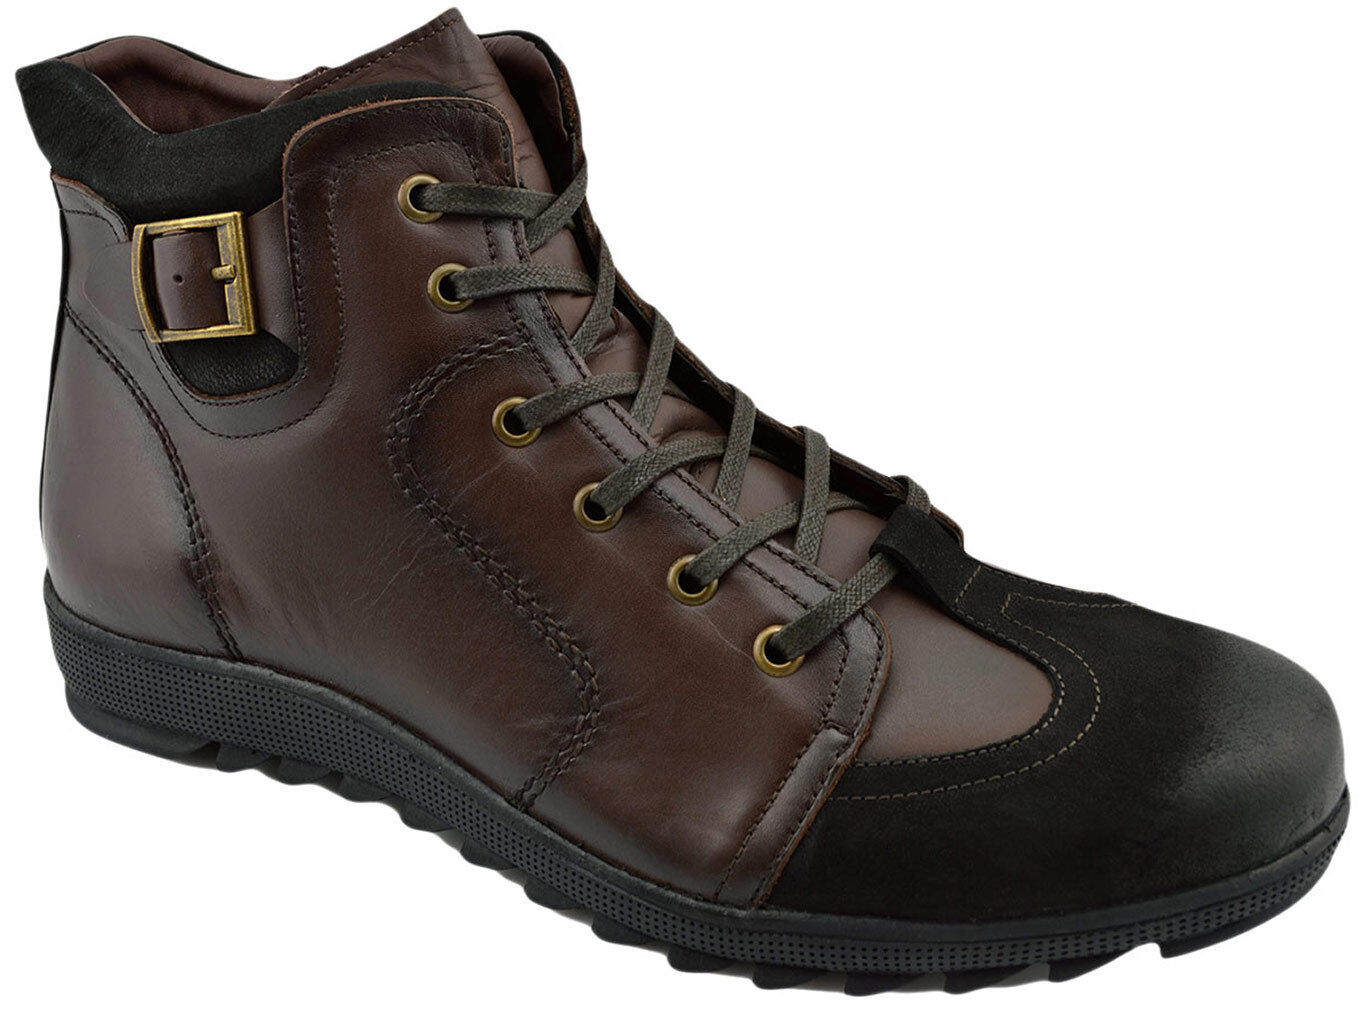 230 OVATTO Brown 2 Tone Calf Pelle Ankle Stivali Uomo Shoes NEW COLLECTION